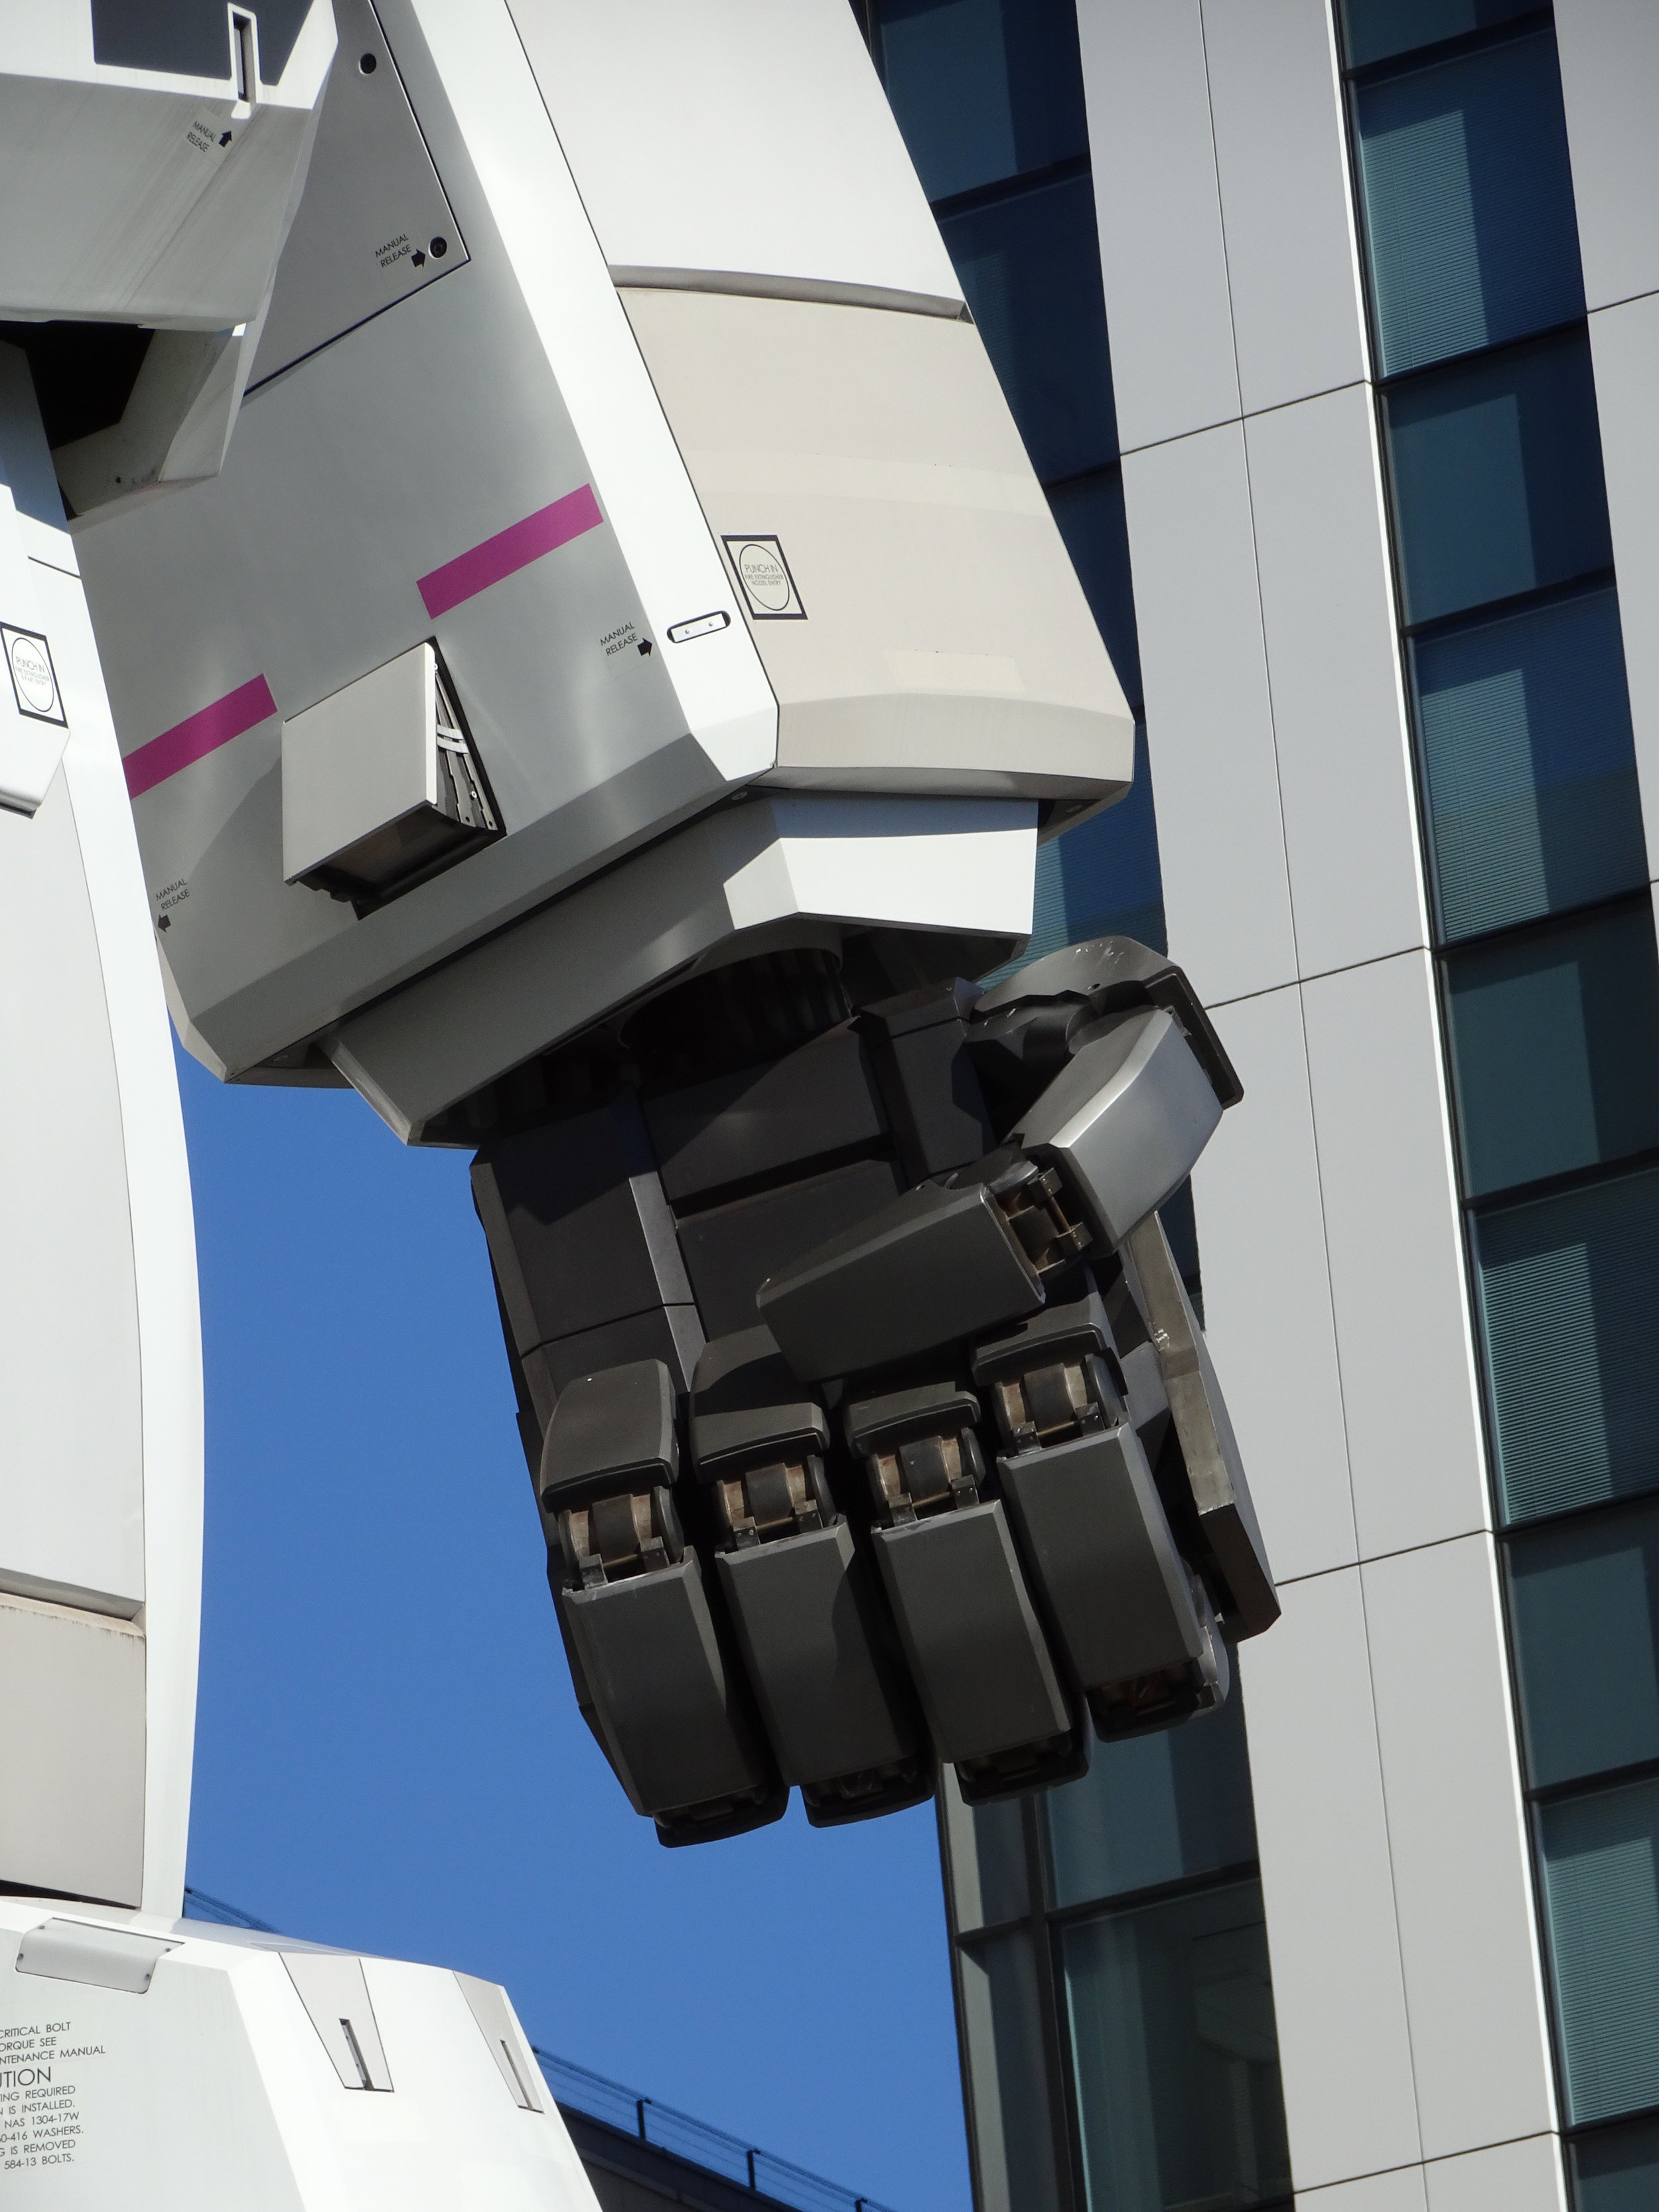 RX-78-2 Gundam 1-1 Statue - 018.jpg